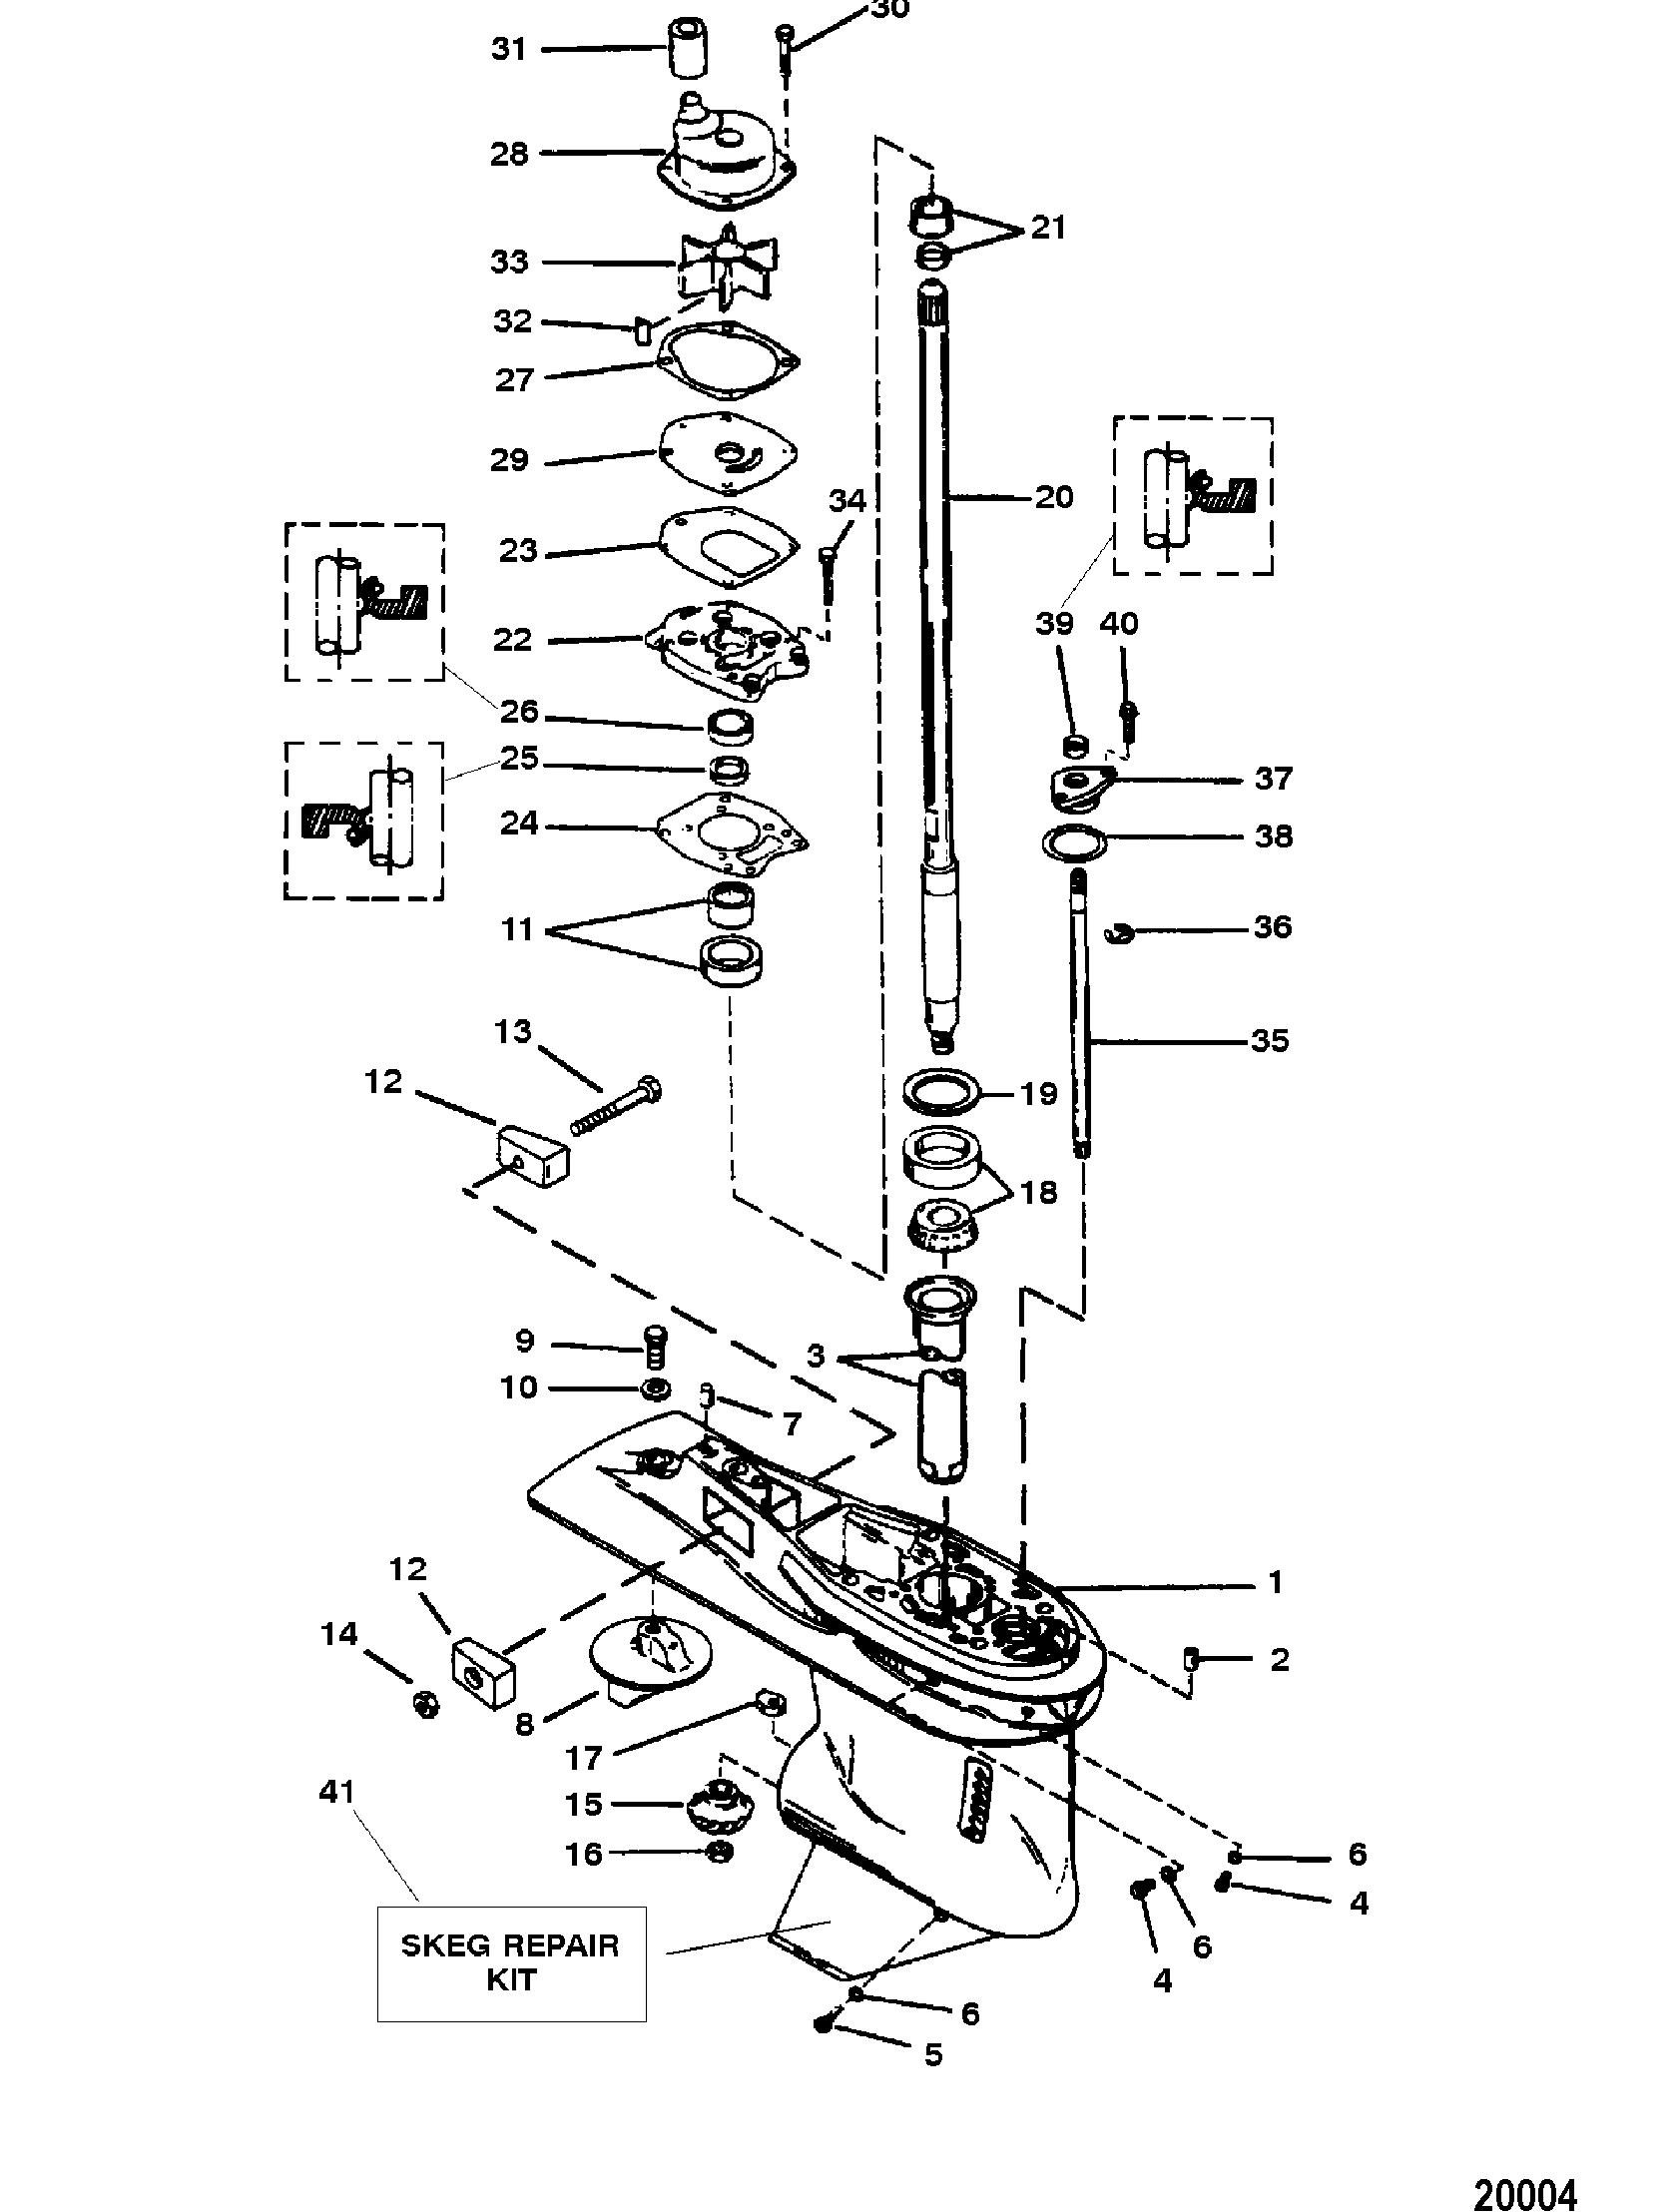 Mercury | FORCE | 90 H.P. (1997) | 0E203000 THRU 0E287999 | Gear Housing  Assembly(Driveshaft) (3 Jaw Reverse Clutch)